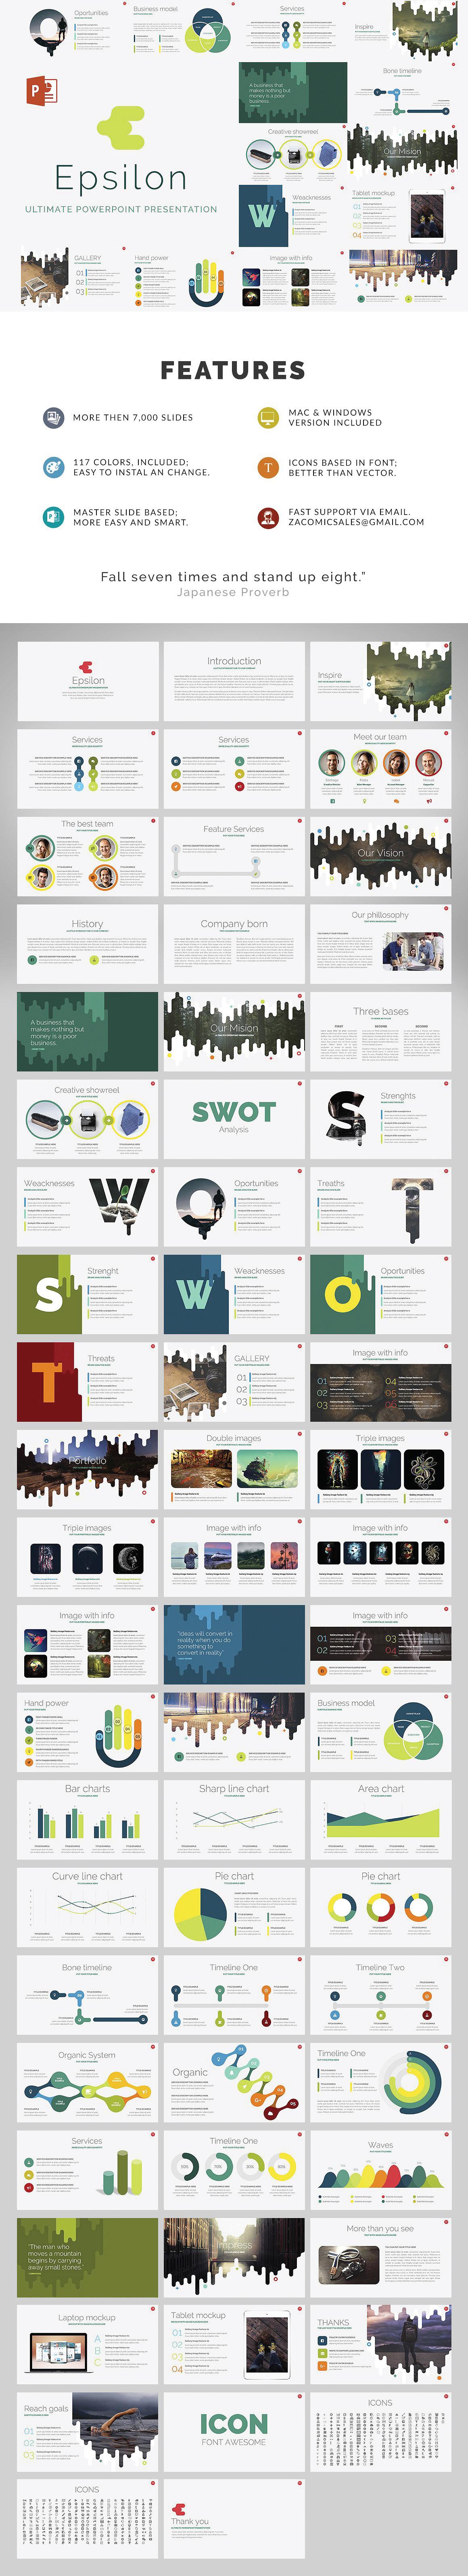 Epsilon free powerpoint template on behance toneelgroepblik Image collections